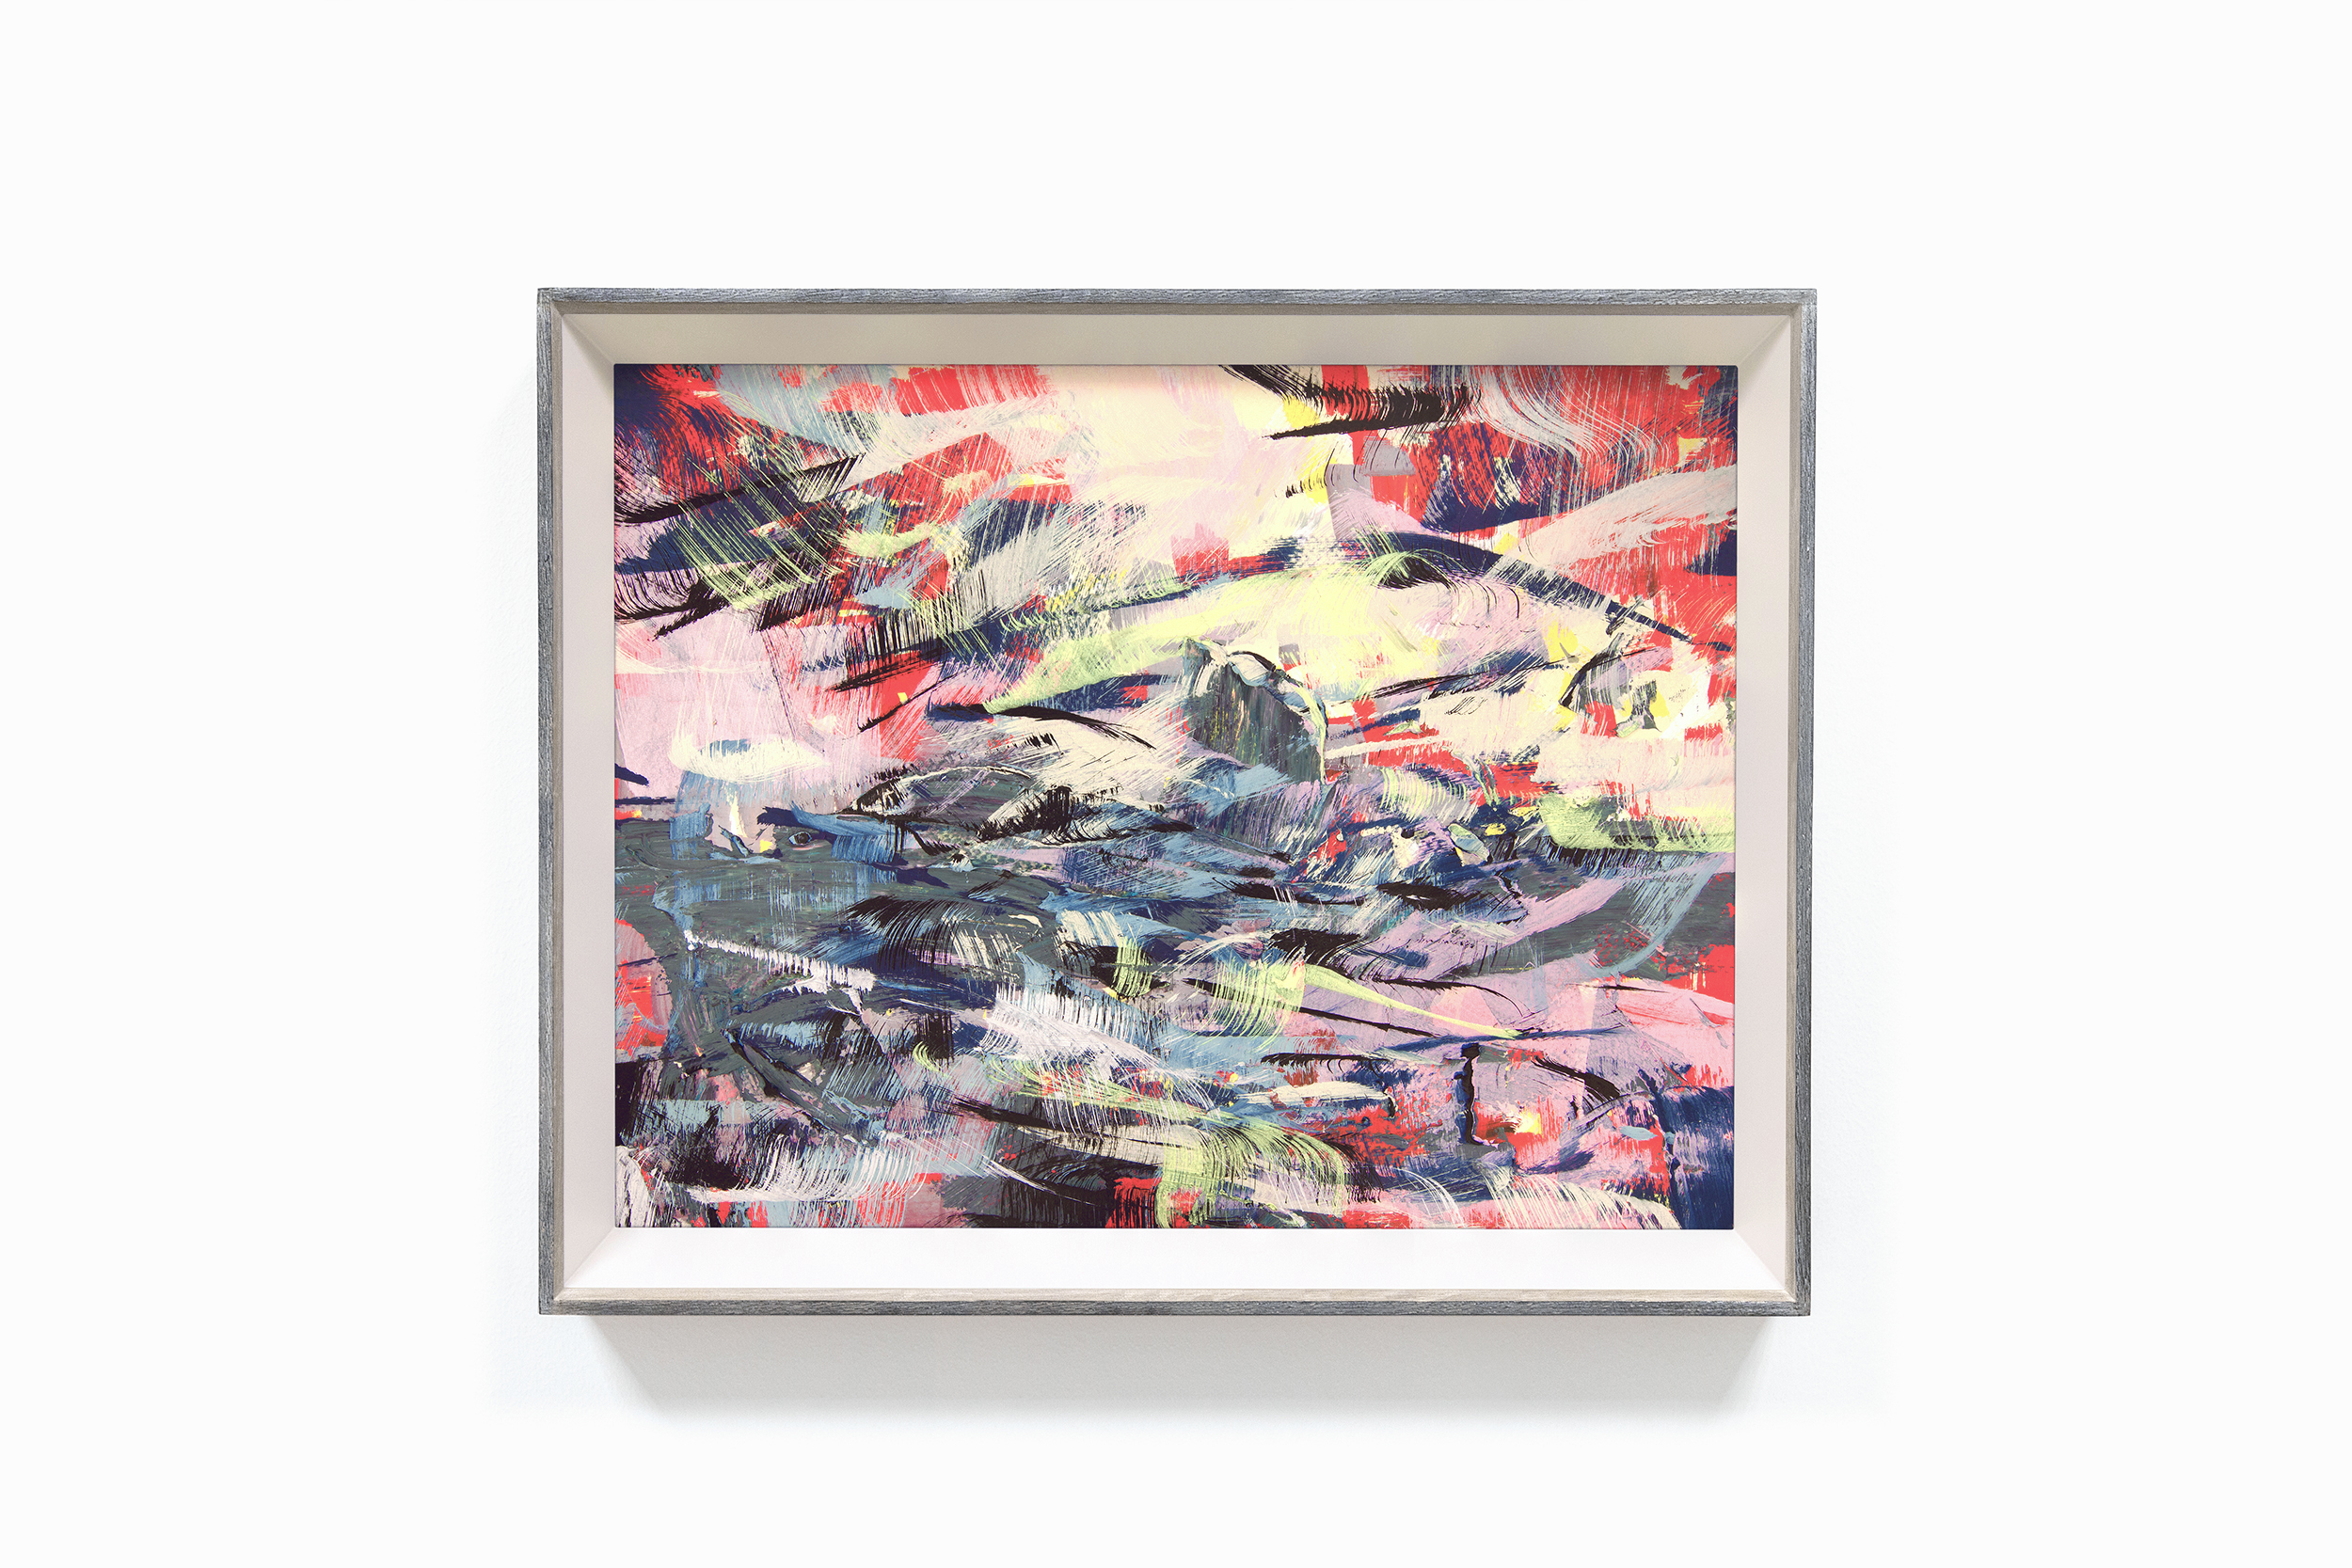 bonjourmolotov Untitled A Illustration Ilustracao painting pintura acrylic acrílico canvas tela paper cardboard mdf Andre Gigante 02N3.jpg